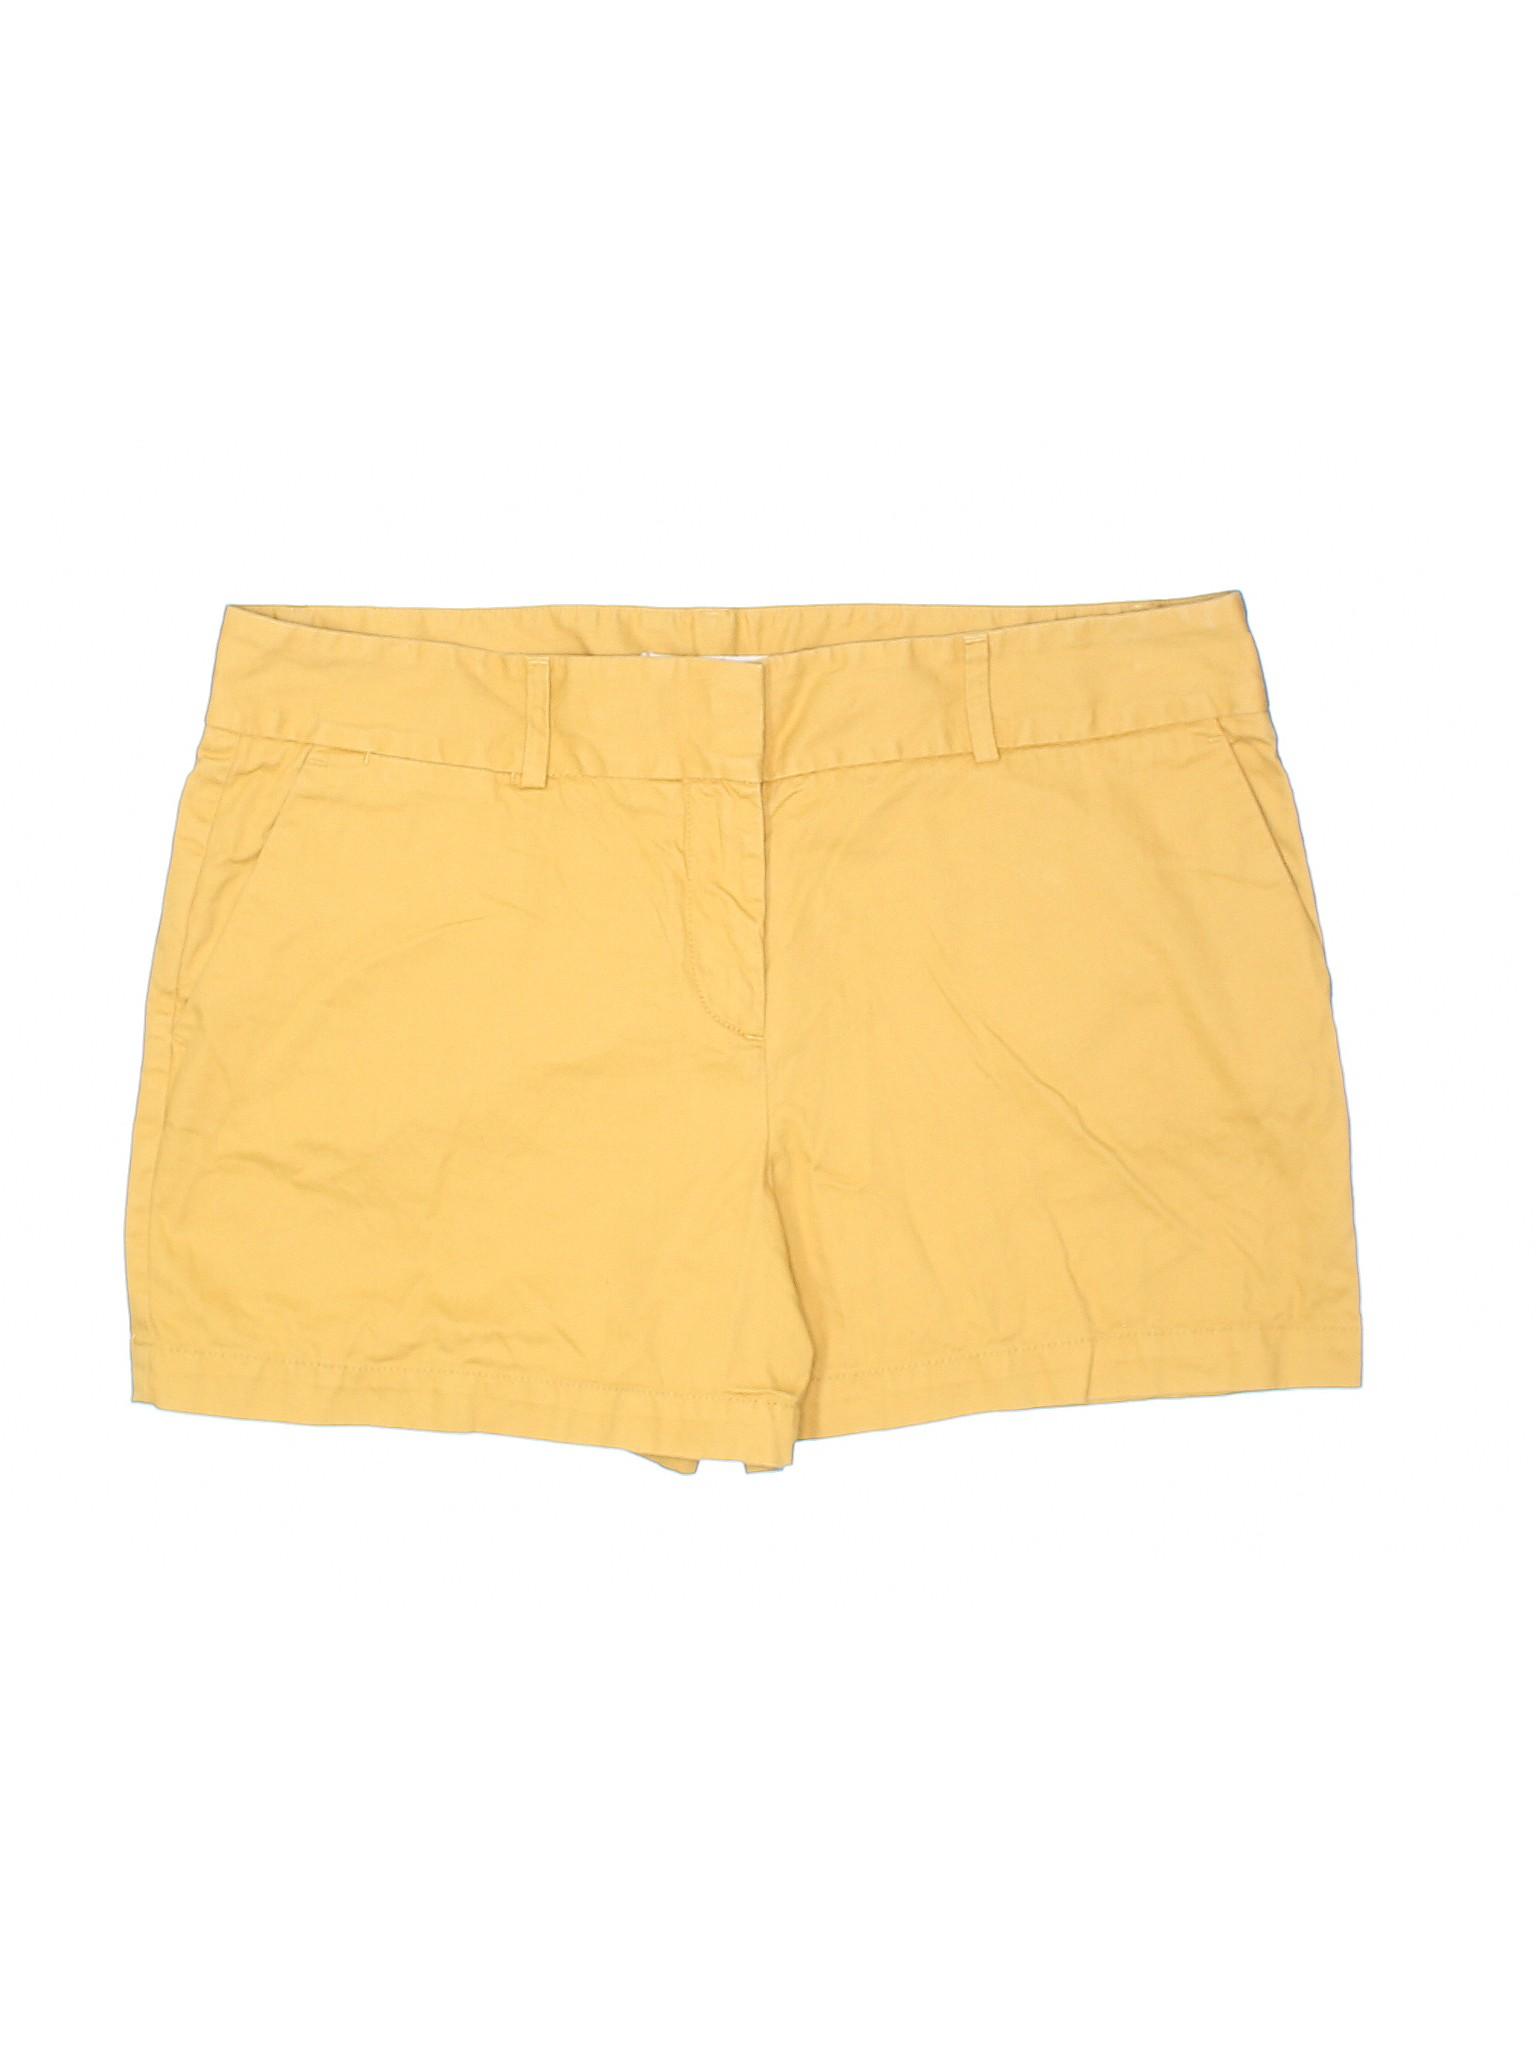 LOFT Ann Khaki Taylor Shorts Boutique awxqO1ESqZ